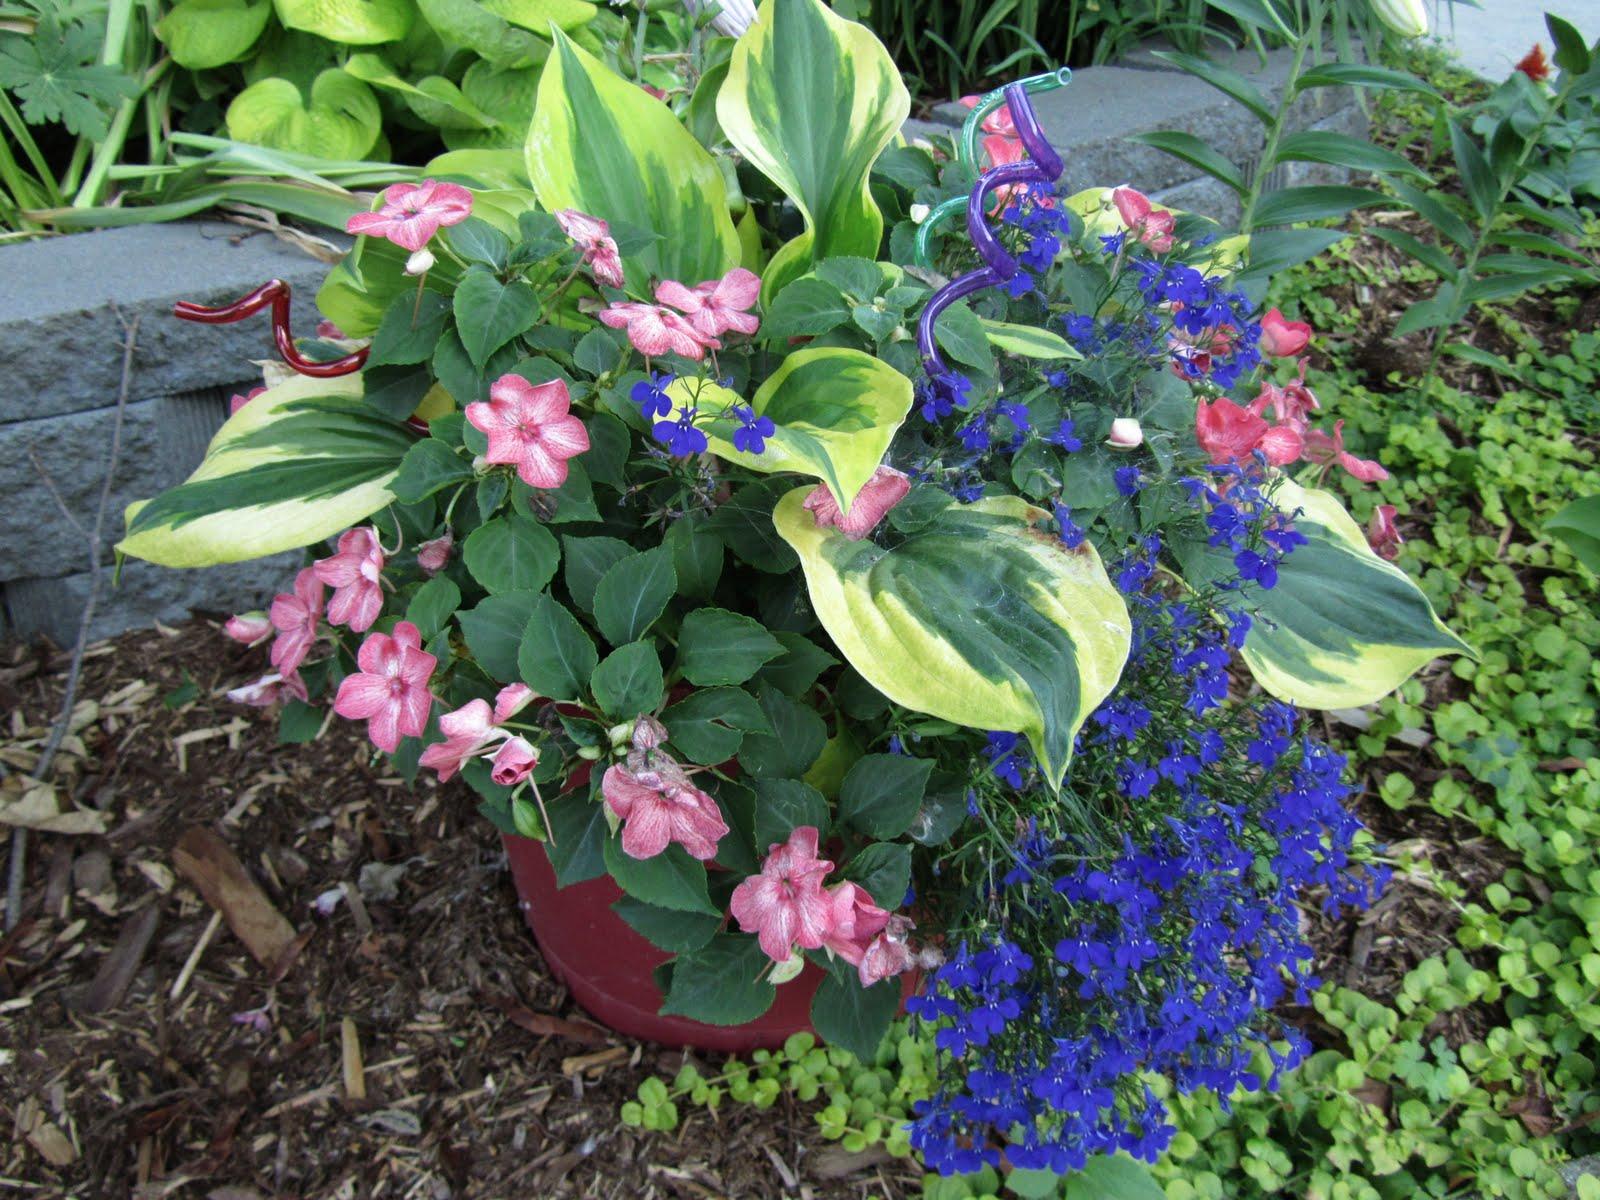 Hosta In Container Gardens Gardening Flower And Vegetables